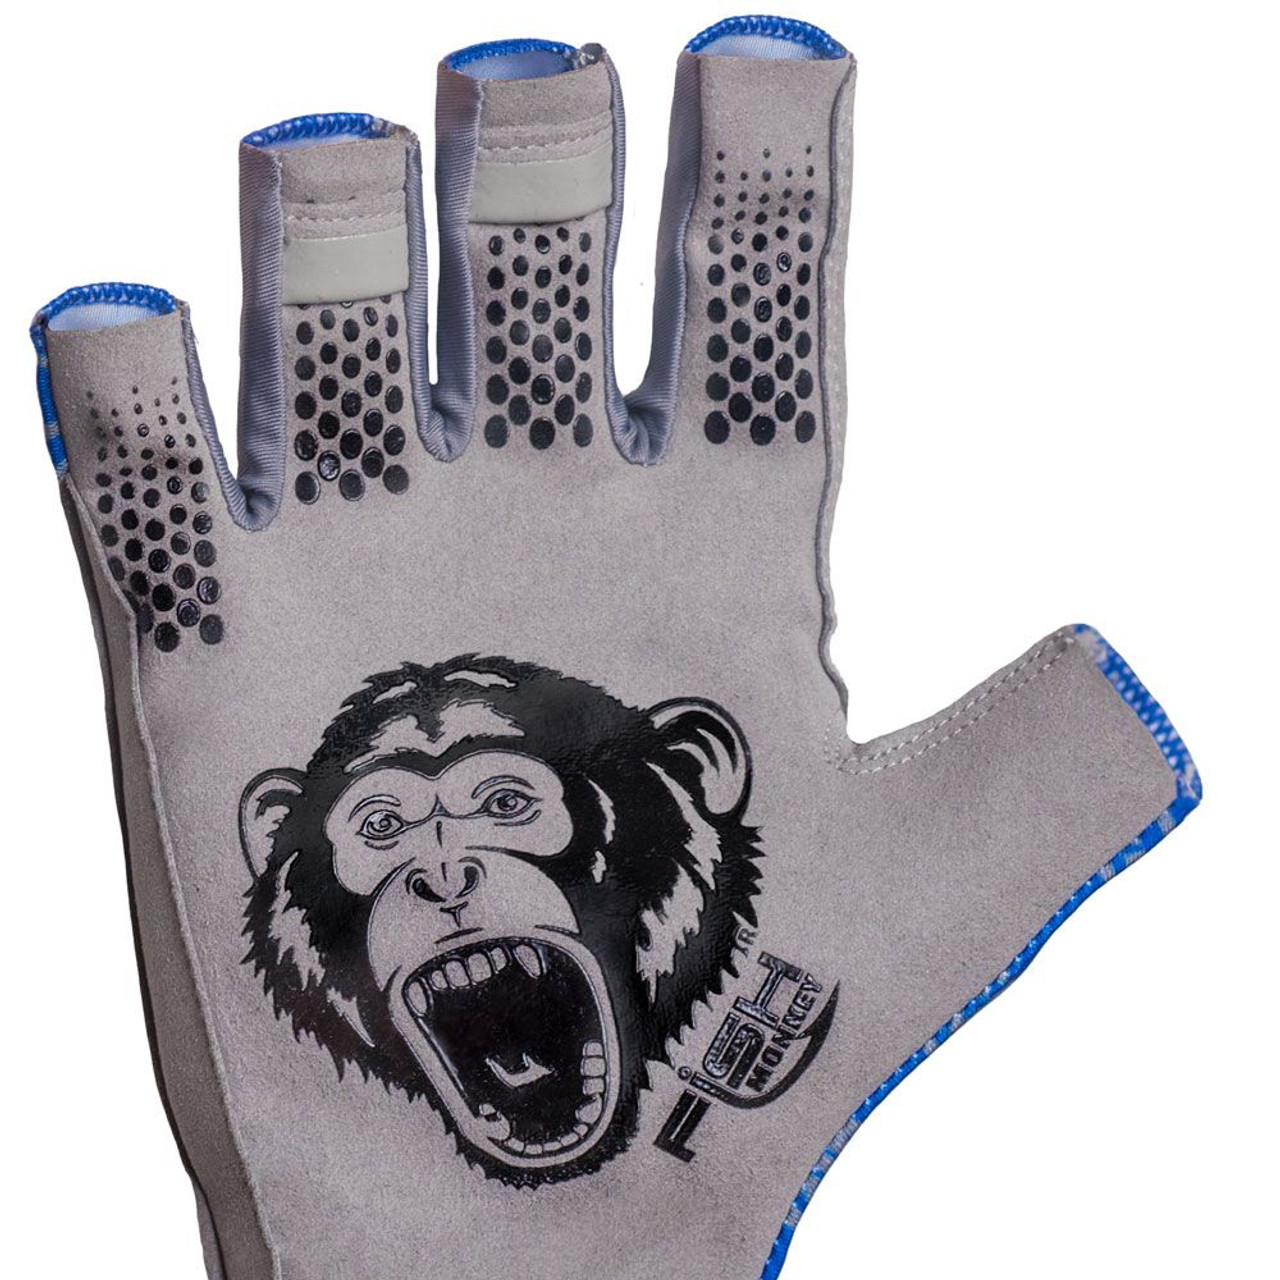 Fish Monkey FM21 Pro 365 Guide Gloves